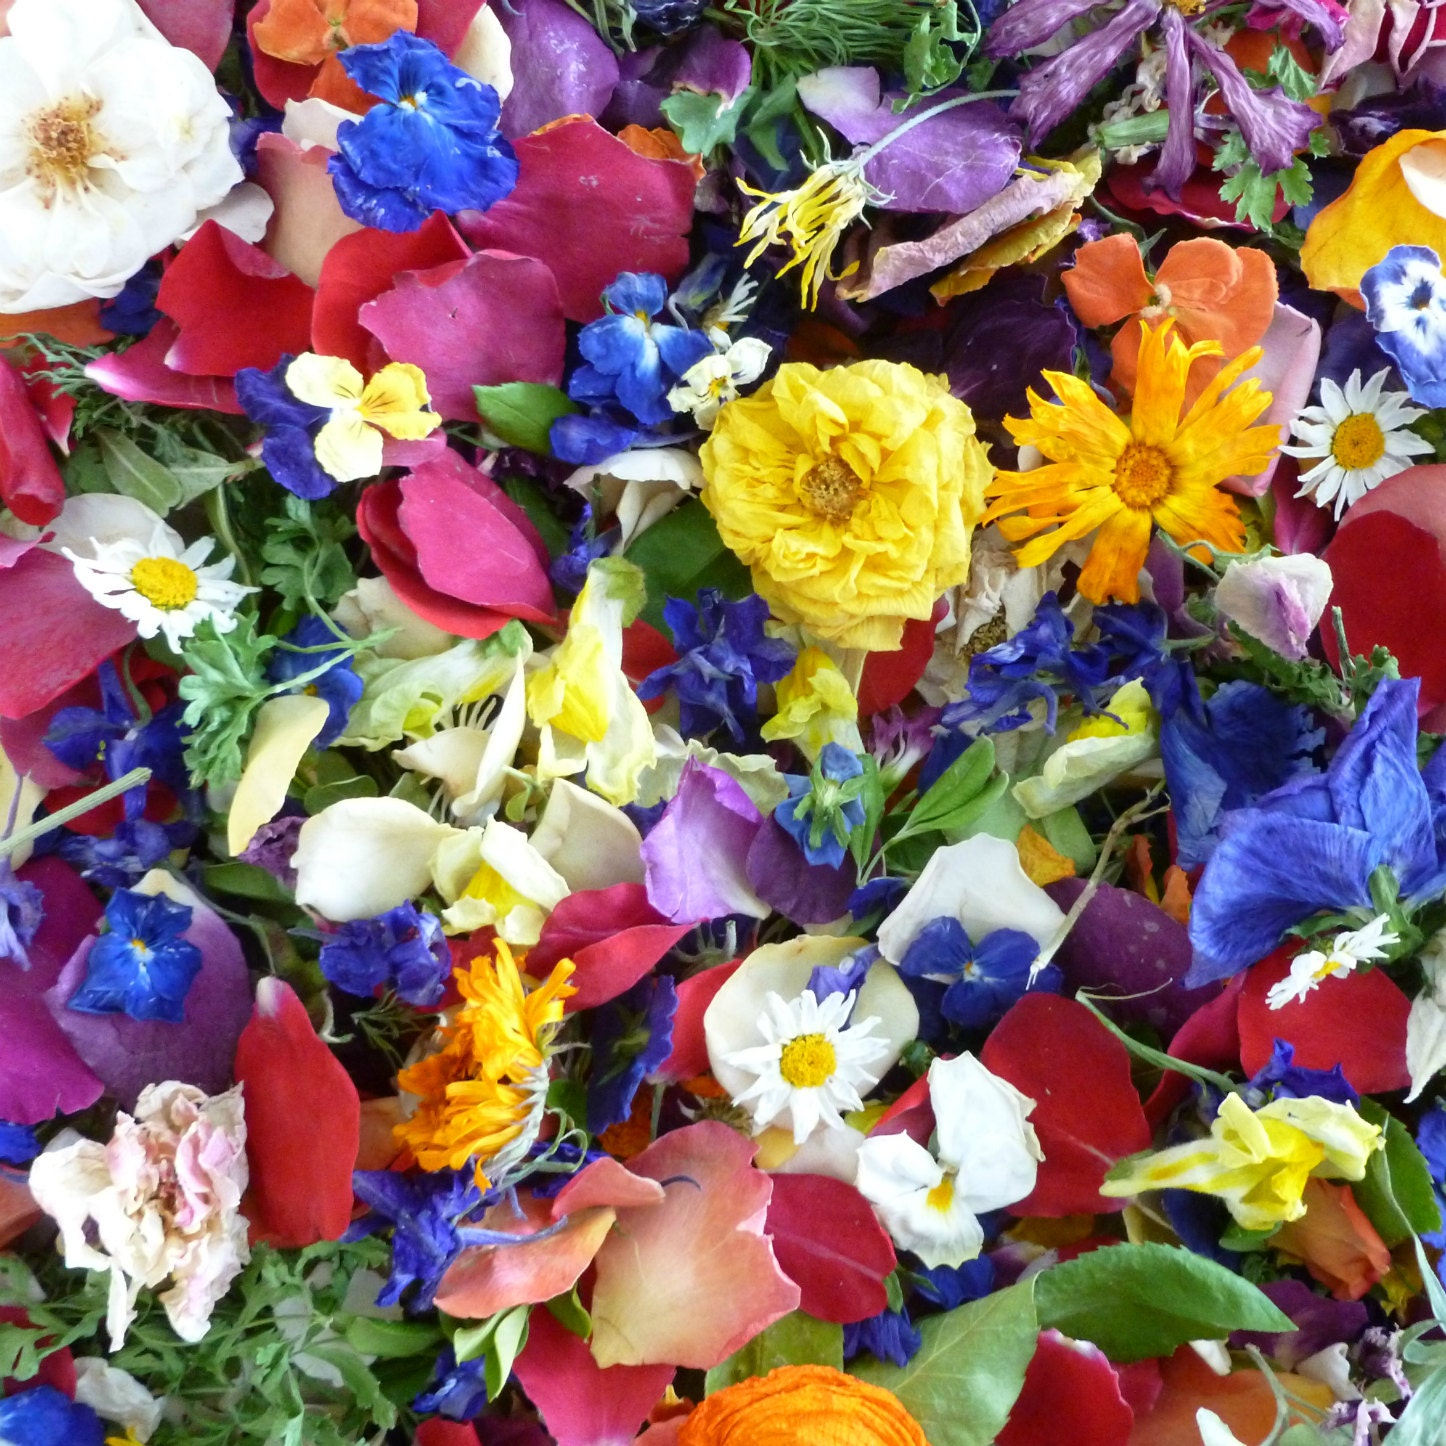 Wedding confetti dried flowers craft supplies wedding for Dried flowers craft supplies